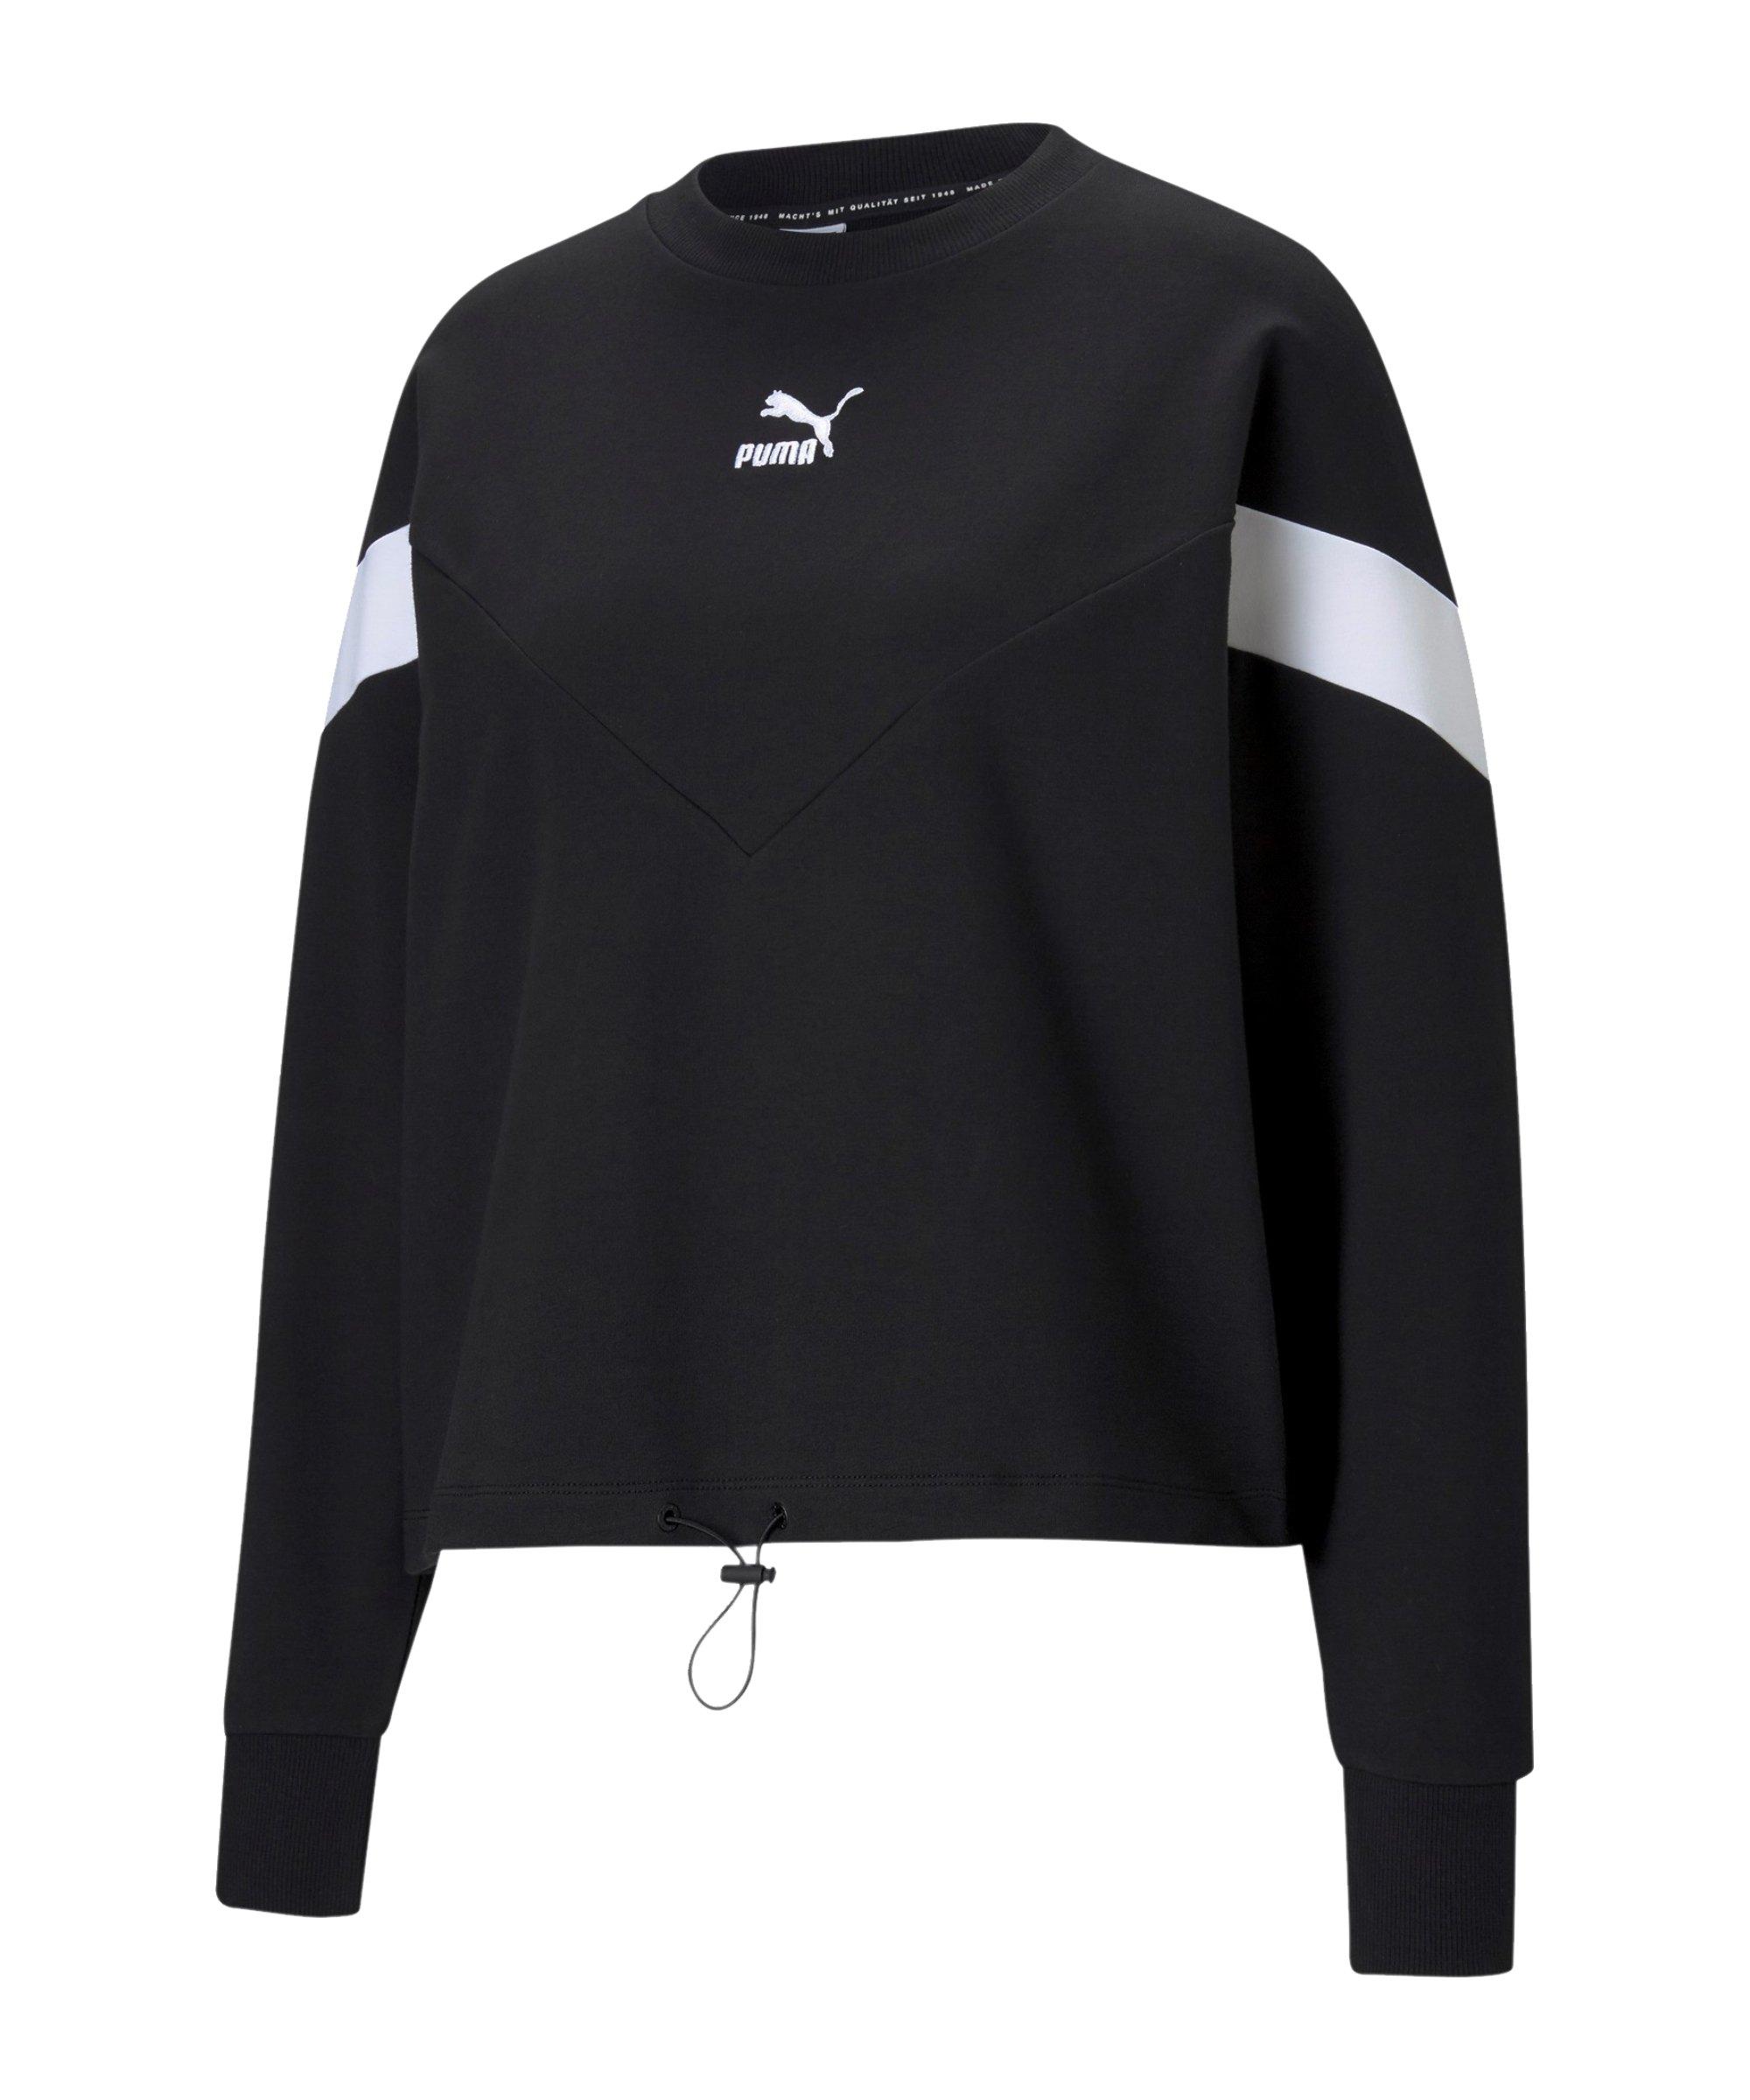 PUMA Iconic MCS Cropped Sweatshirt Damen F01 - schwarz